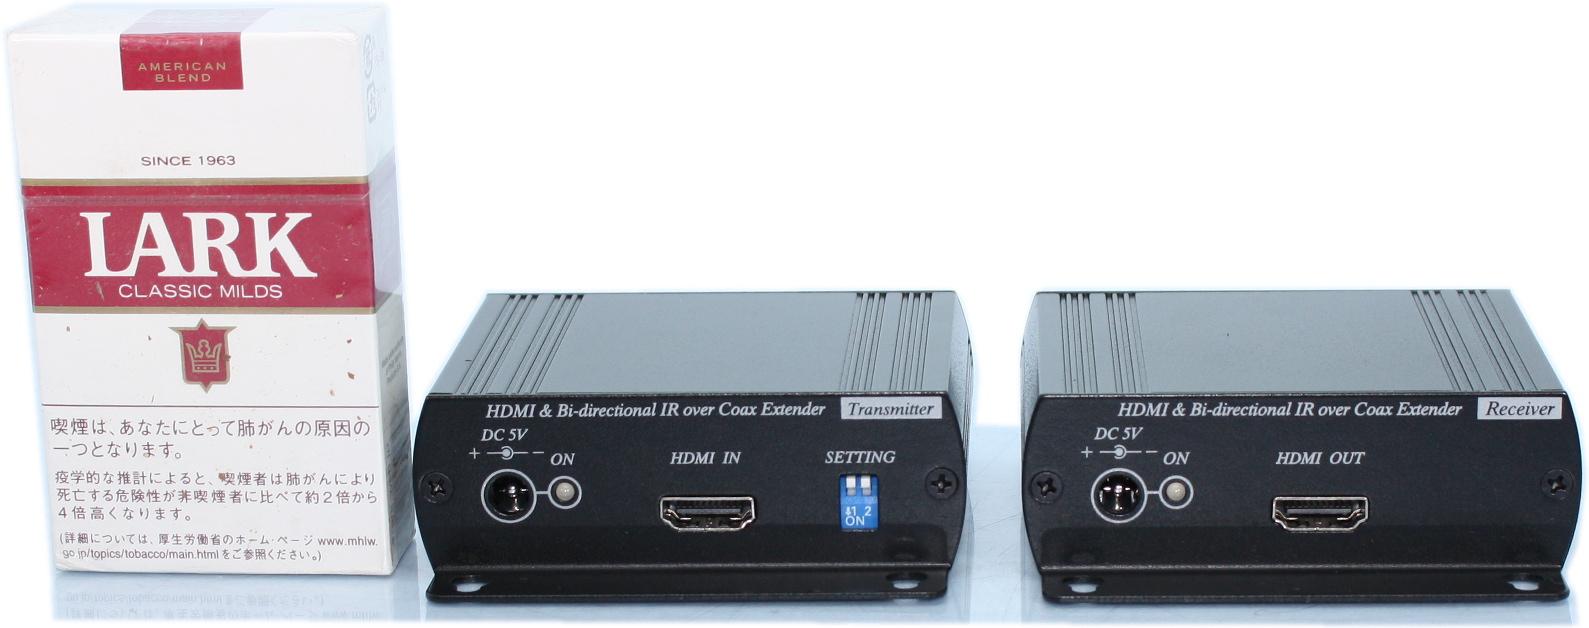 【SA-51149】HDMIエクステンダ-(HDMI延長器)HDMI - 同軸(100mまで)- HDMI TX+RXセット